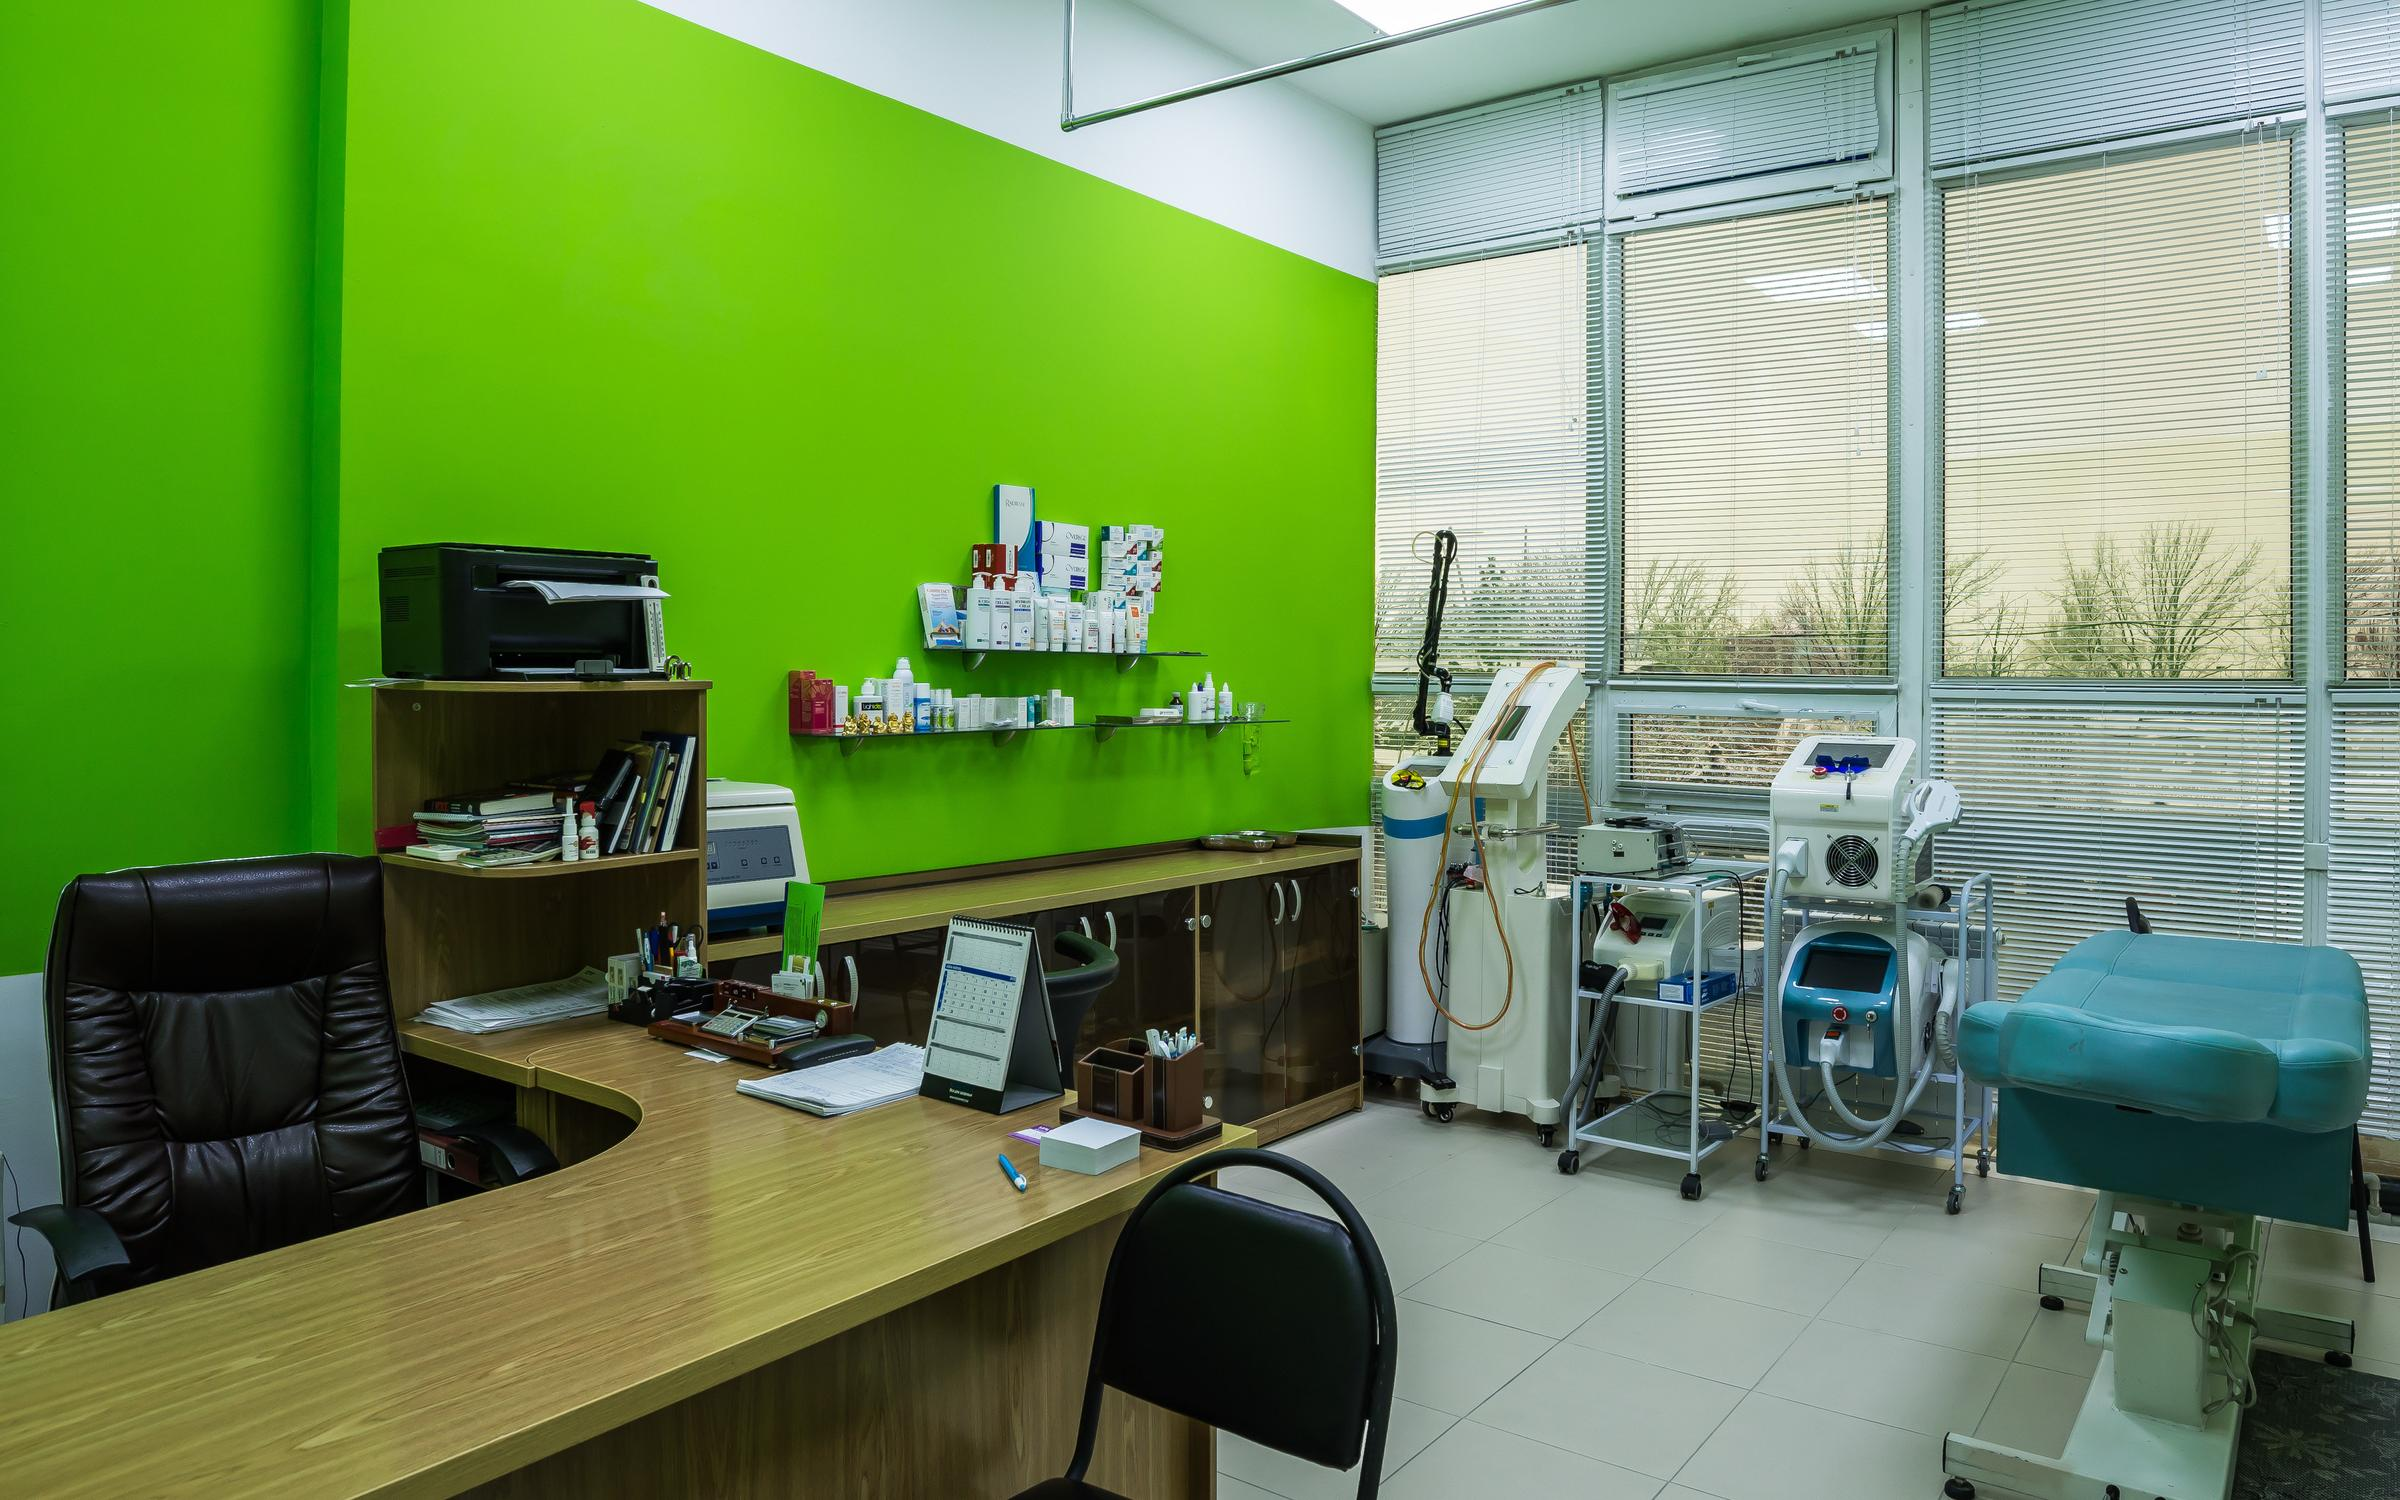 фотография Медицинского центра Достар Мед в 7-м микрорайоне